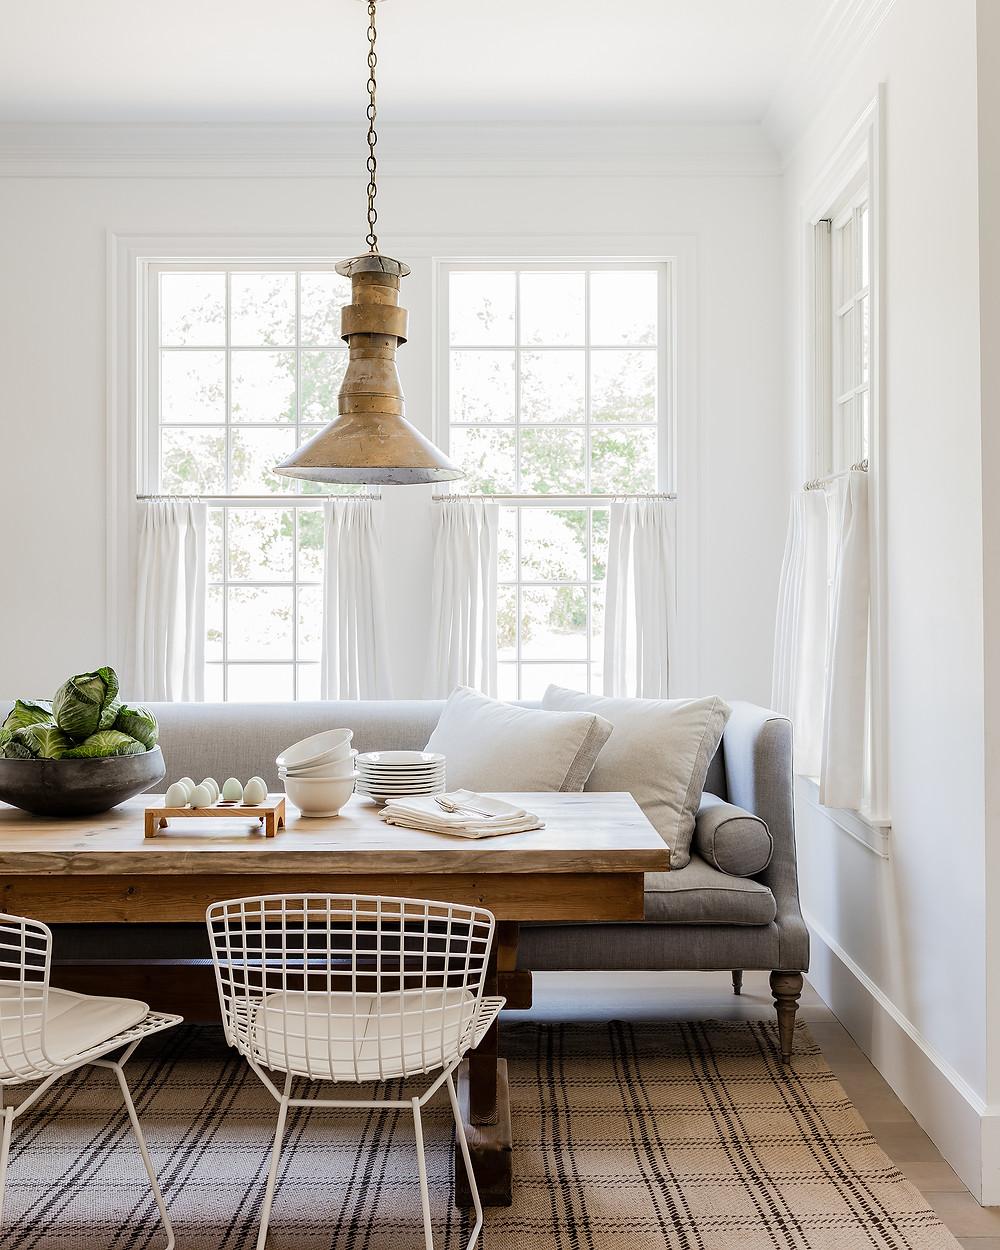 Breakfast Room by Lisa Tharp.  Photo by Michael J. Lee.